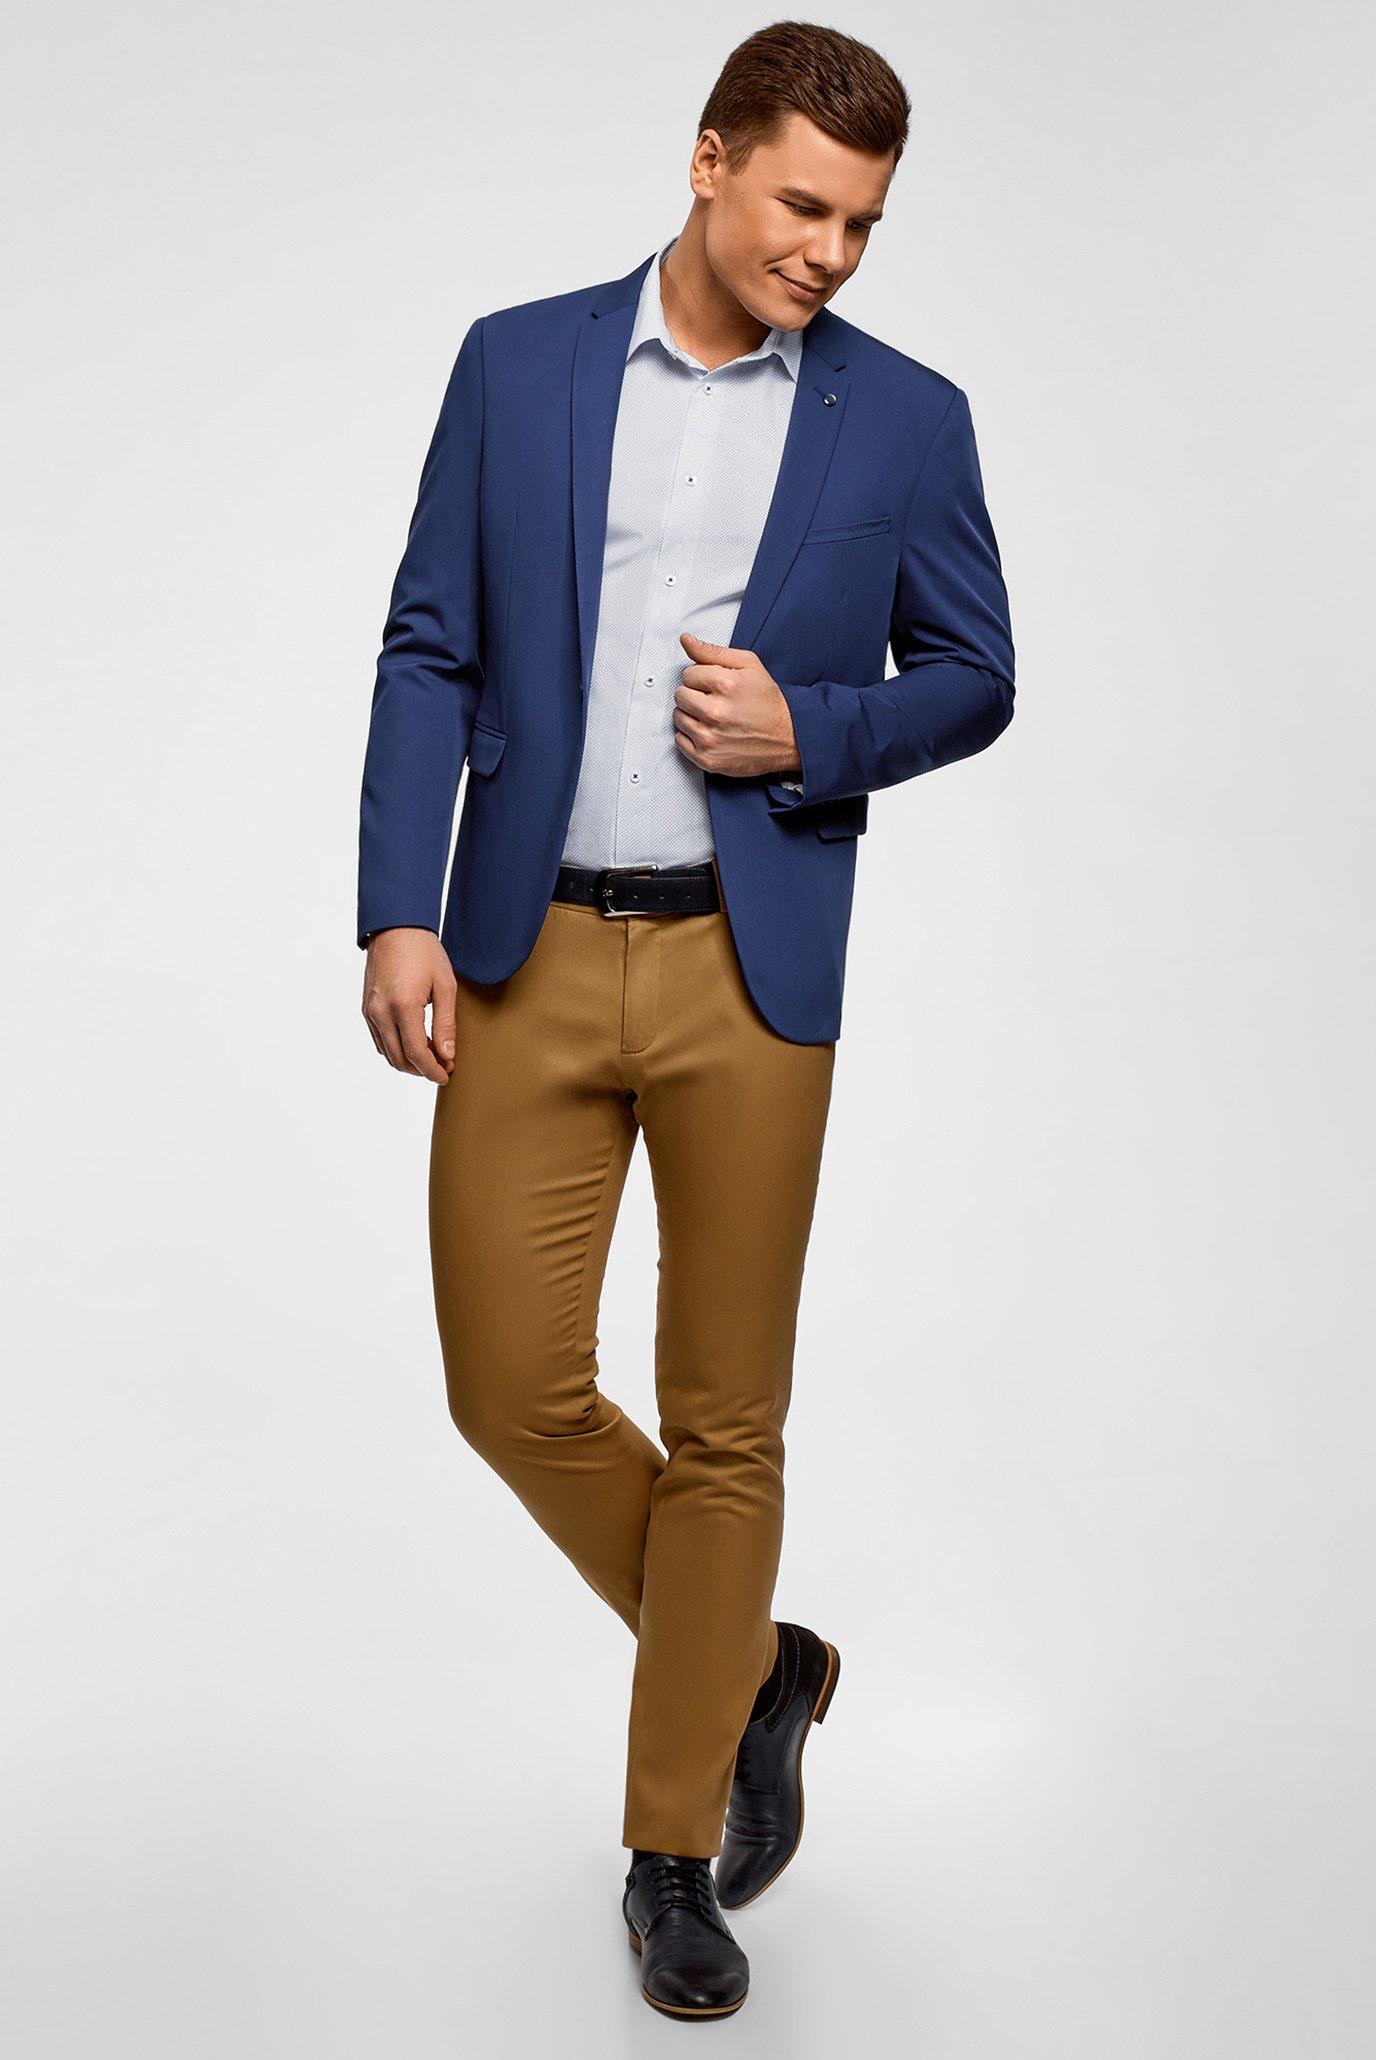 Купить Мужской синий пиджак Oodji Oodji 2B410021M/47747N/7500N – Киев, Украина. Цены в интернет магазине MD Fashion